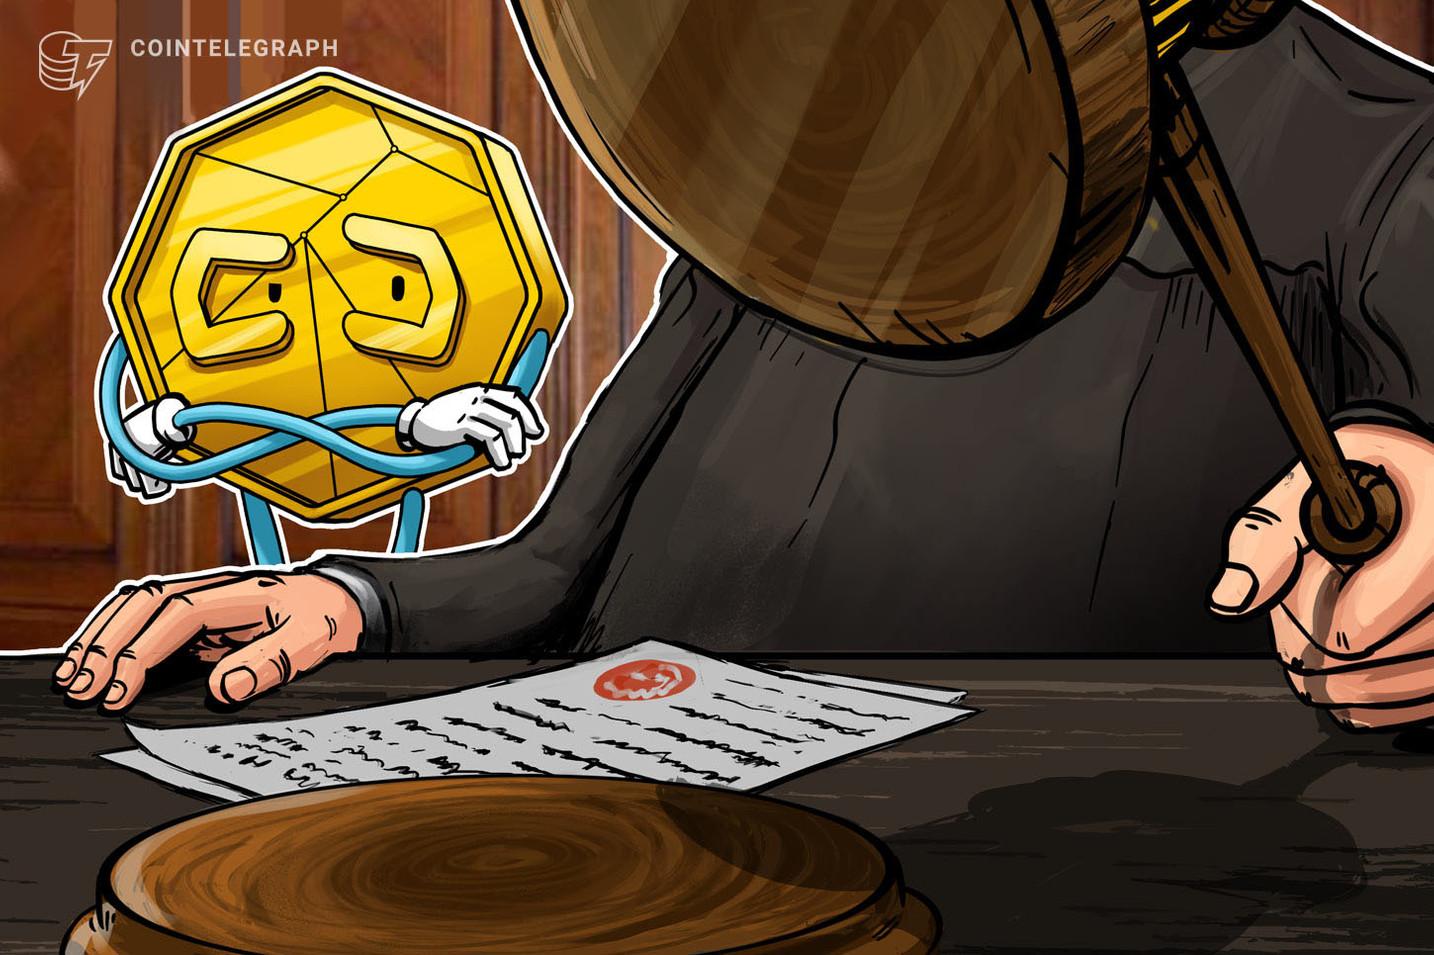 Russian Court: Theft of 100 BTC Isn't a Crime Because Bitcoin Isn't Property